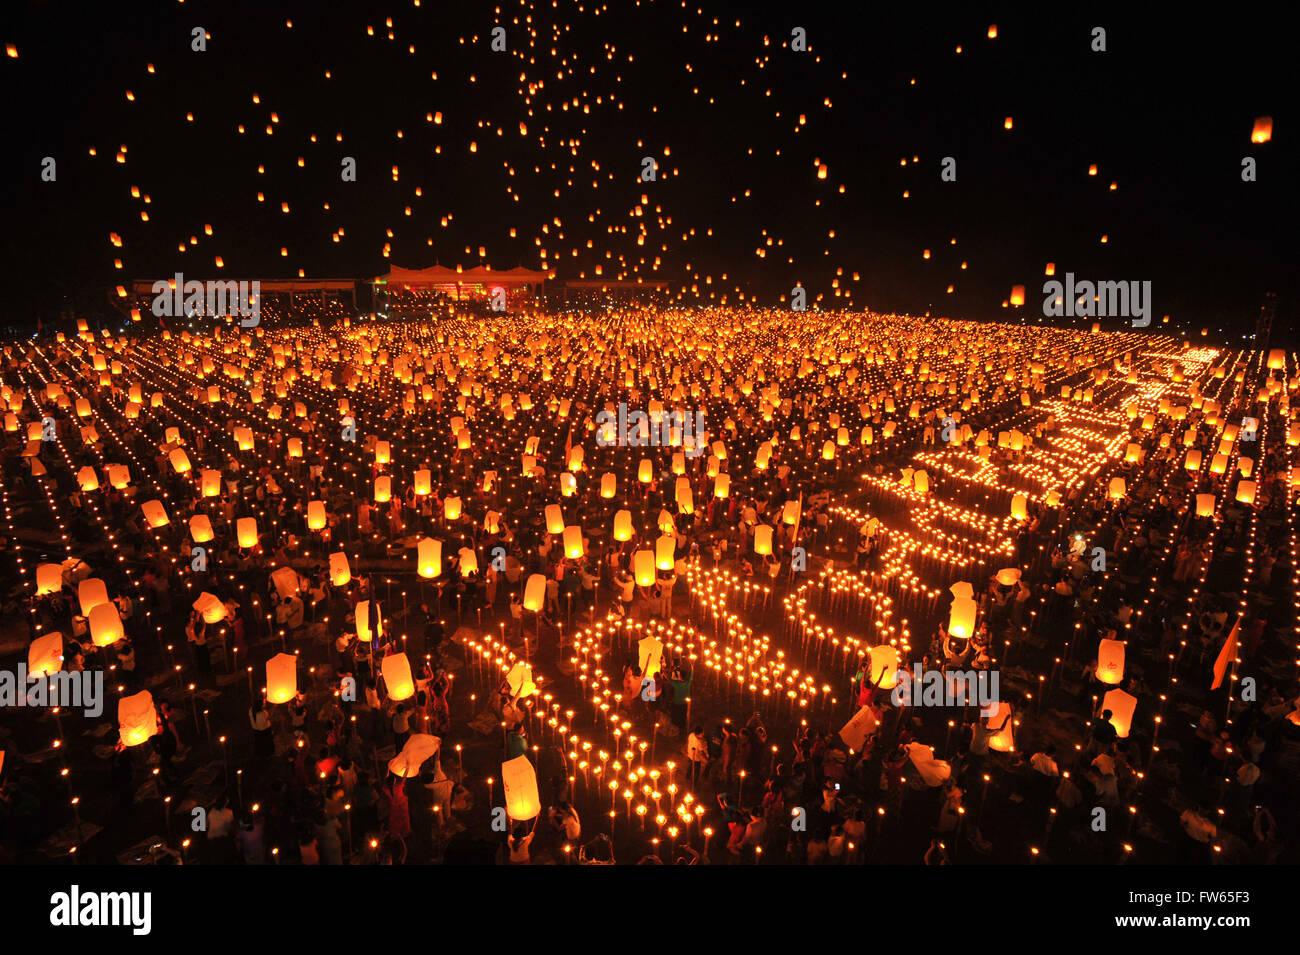 People letting sky lanterns rise, World Peace Festival of the Dhammakaya Foundation, Dawei, Tanintharyi Region, - Stock Image